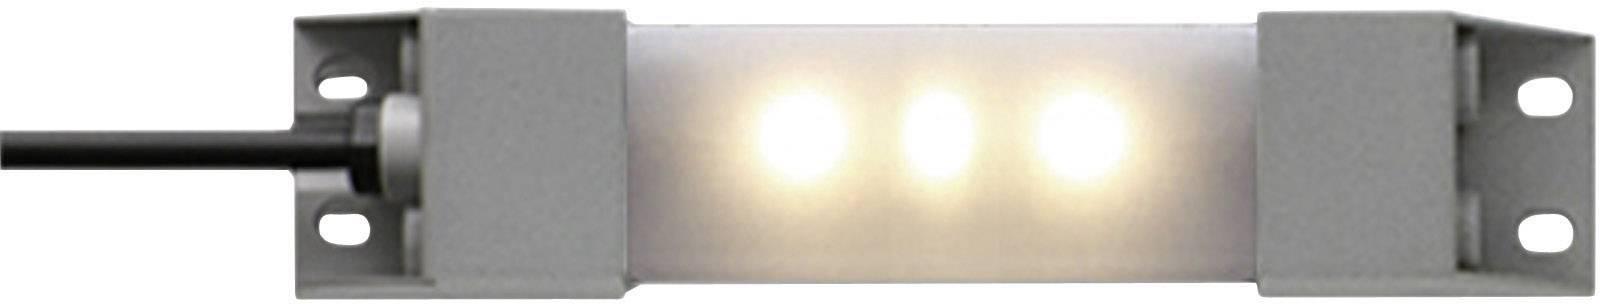 Idec LF1B-NA4P-2TLWW2-3M, teplá biela, 45 lm, 1.5 W, 24 V/DC